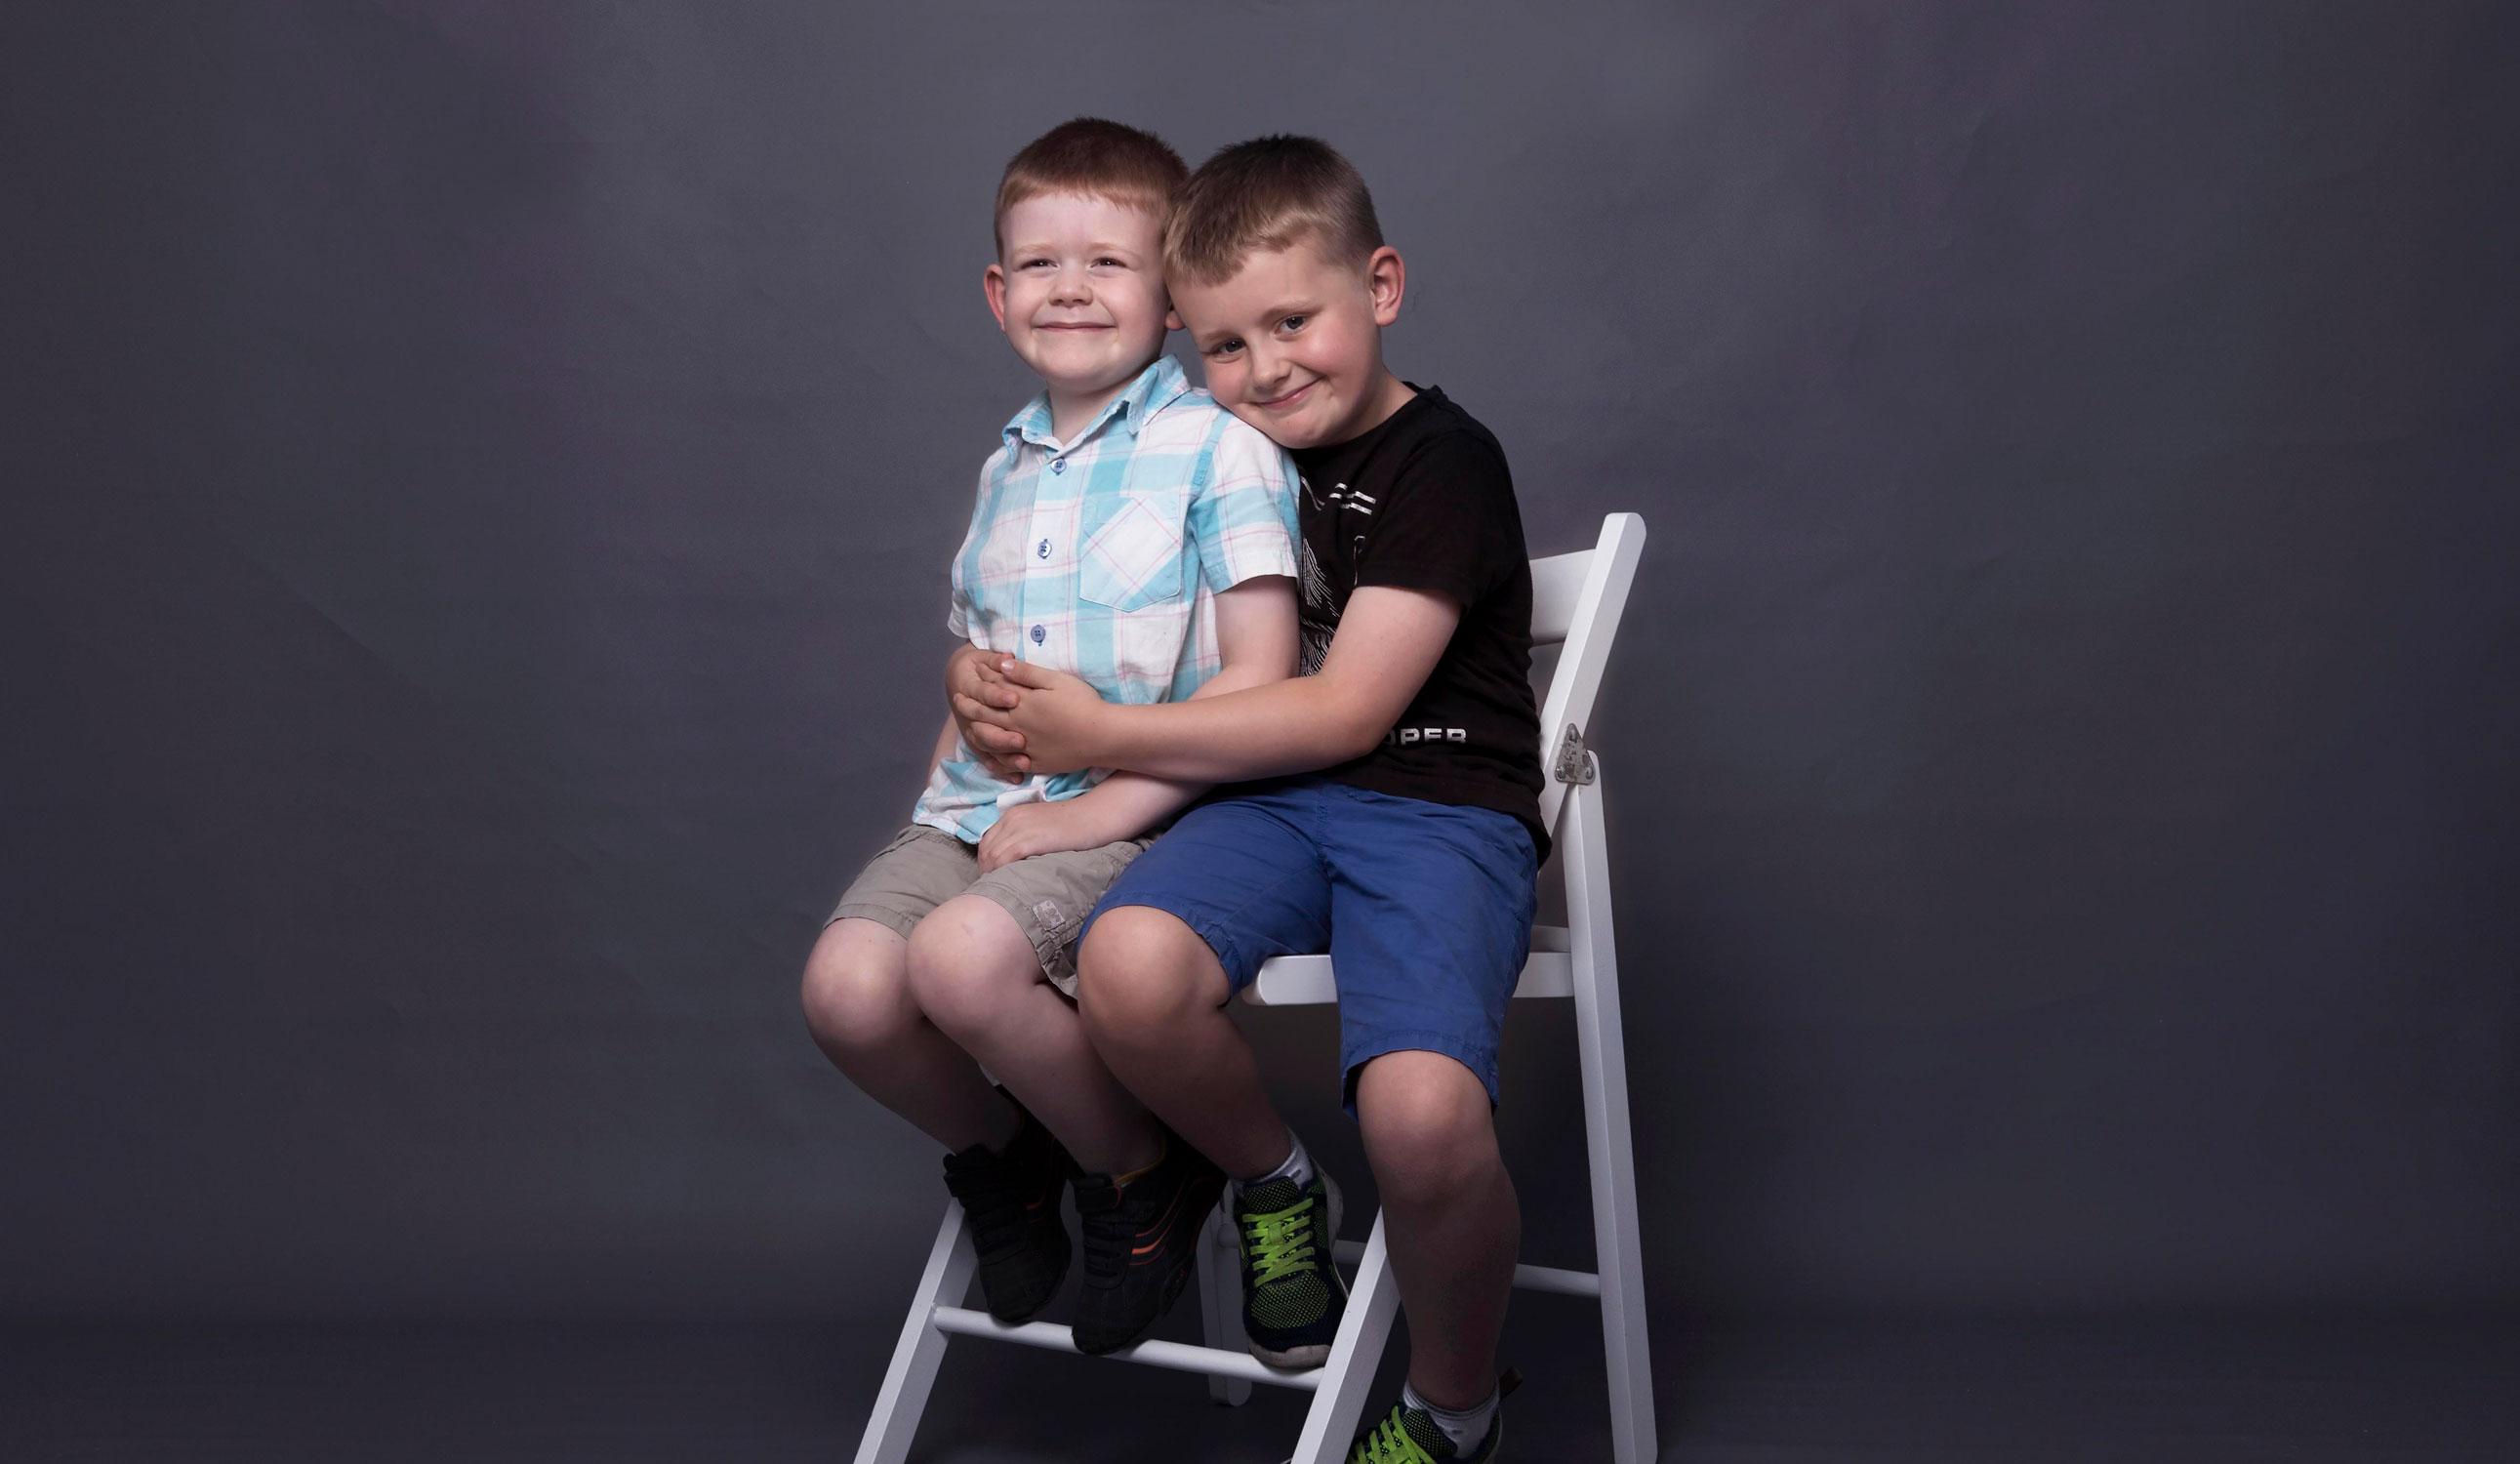 Children Family Portrait Photography